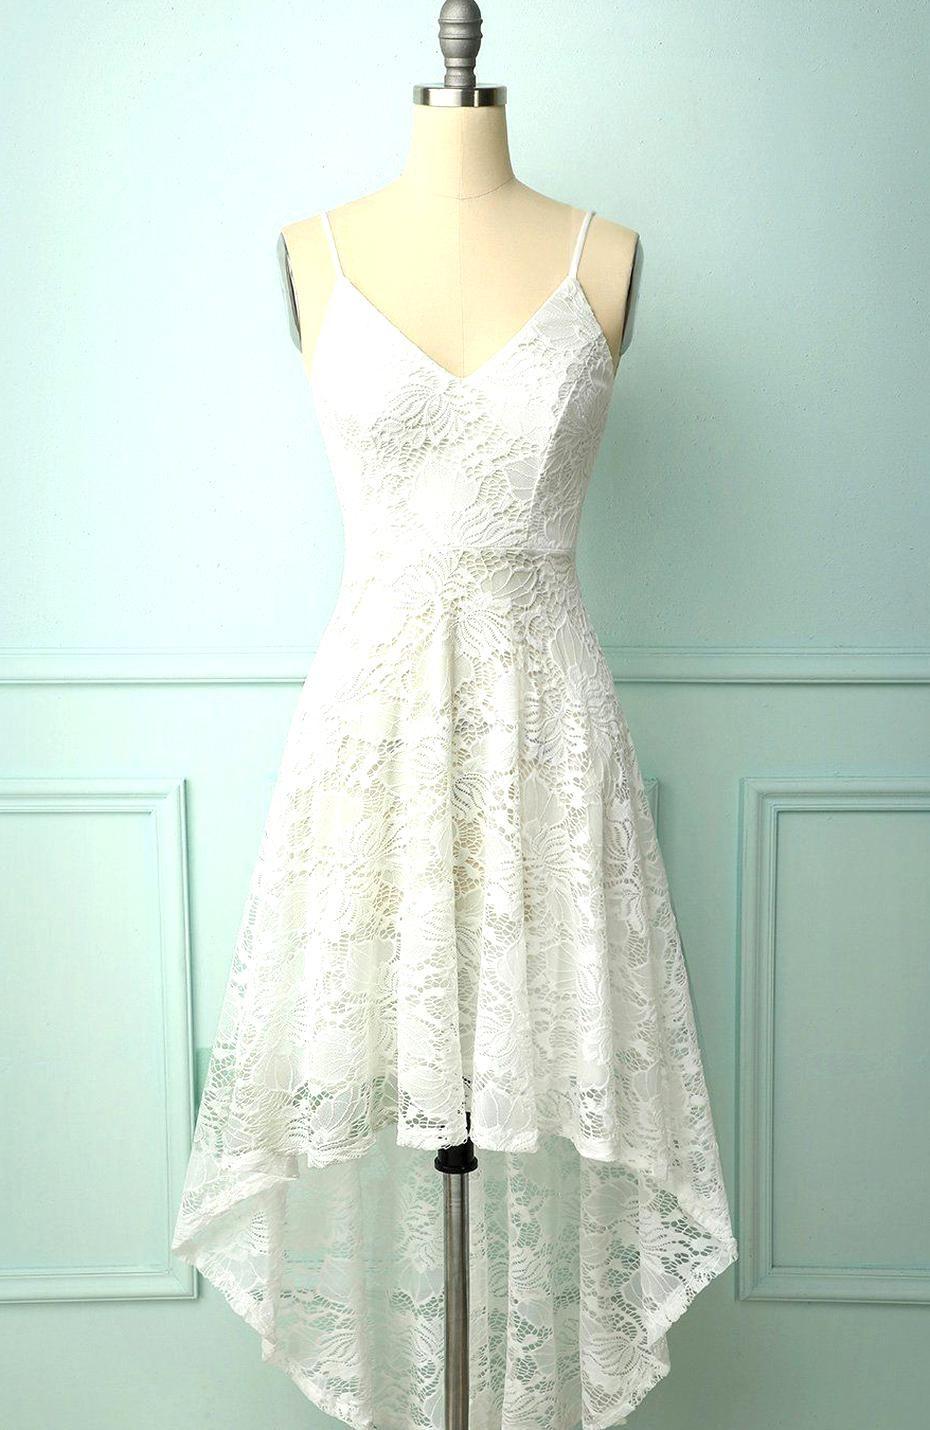 Vintage A Line Spaghetti Straps High Low White Lace Prom Dress Zapaka White Beach Dress Short Lace White Dress Vintage Formal Dresses [ 1430 x 930 Pixel ]